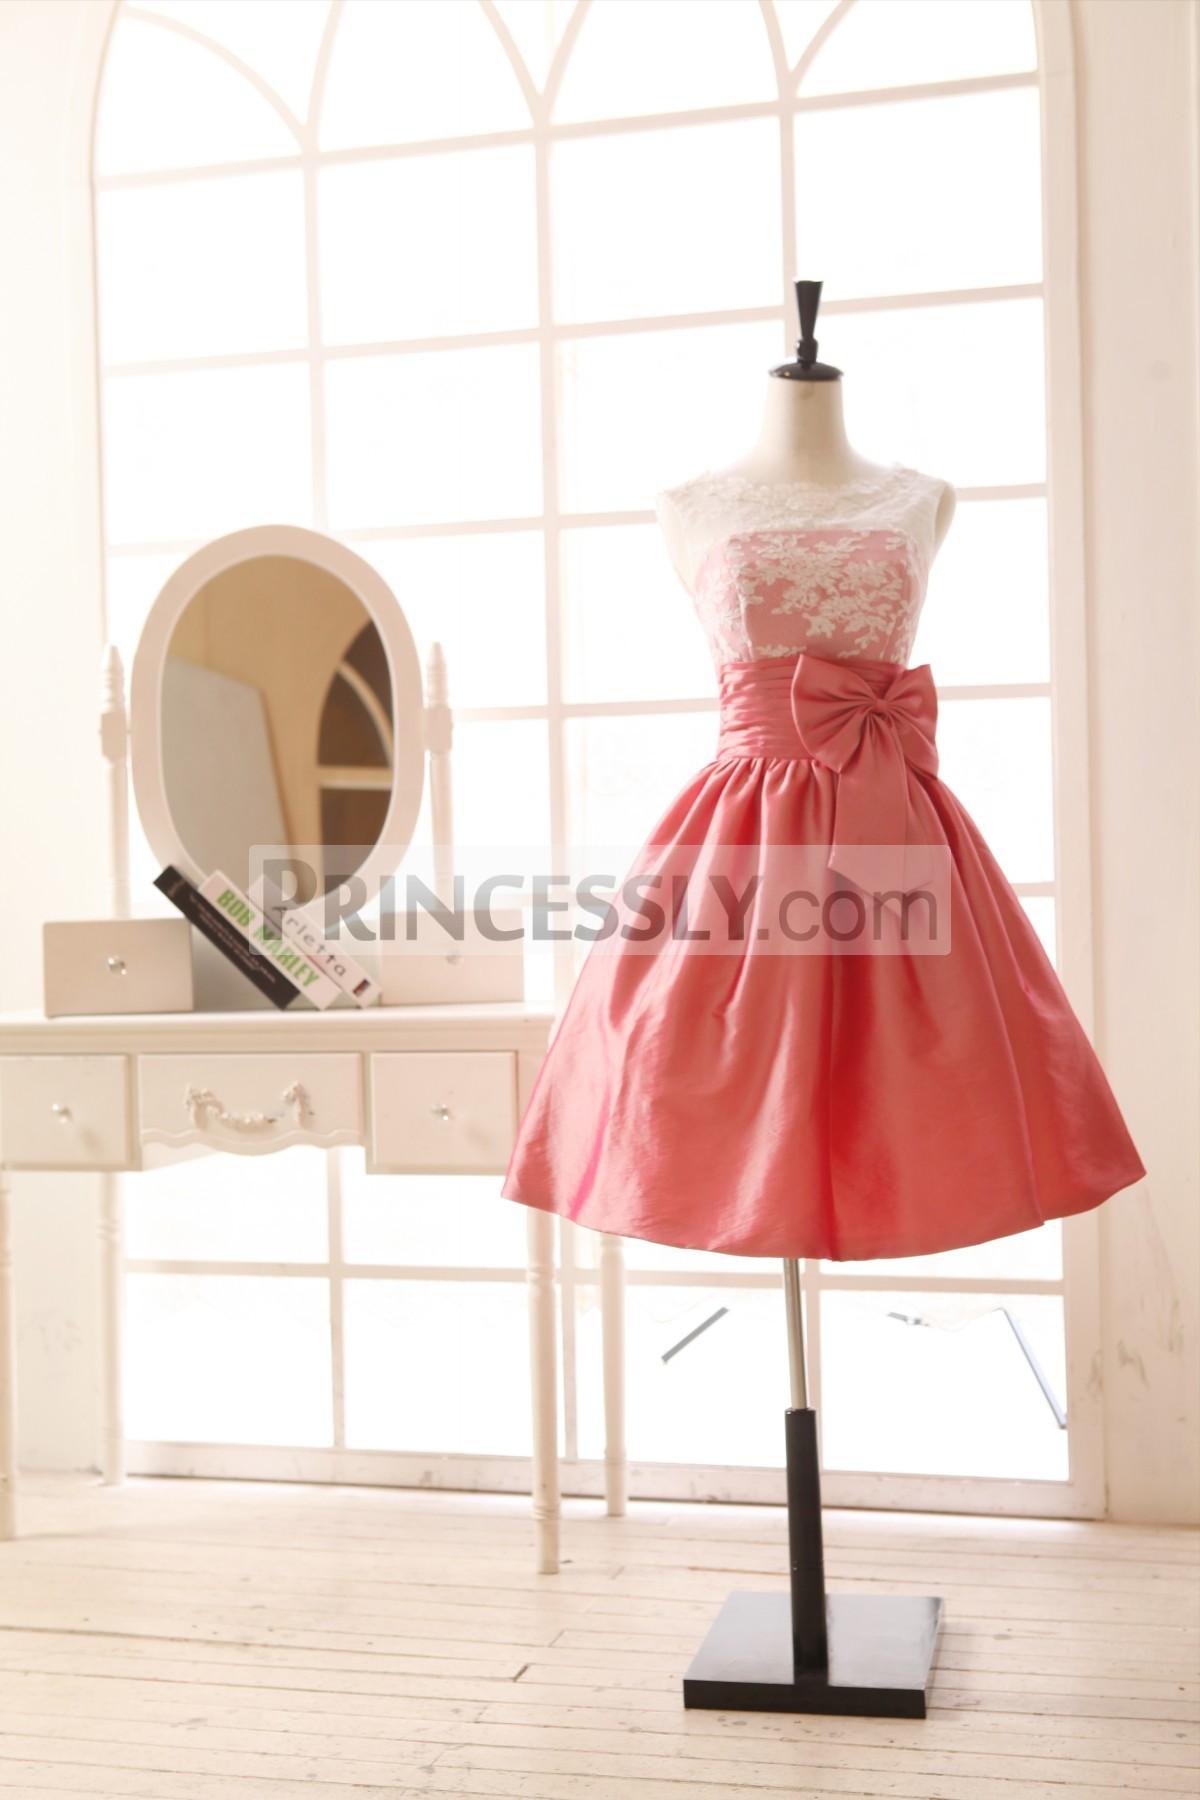 Princessly.com-K1001958-Coral Lace Taffeta Bridesmaid Dress in knee Short Length-31